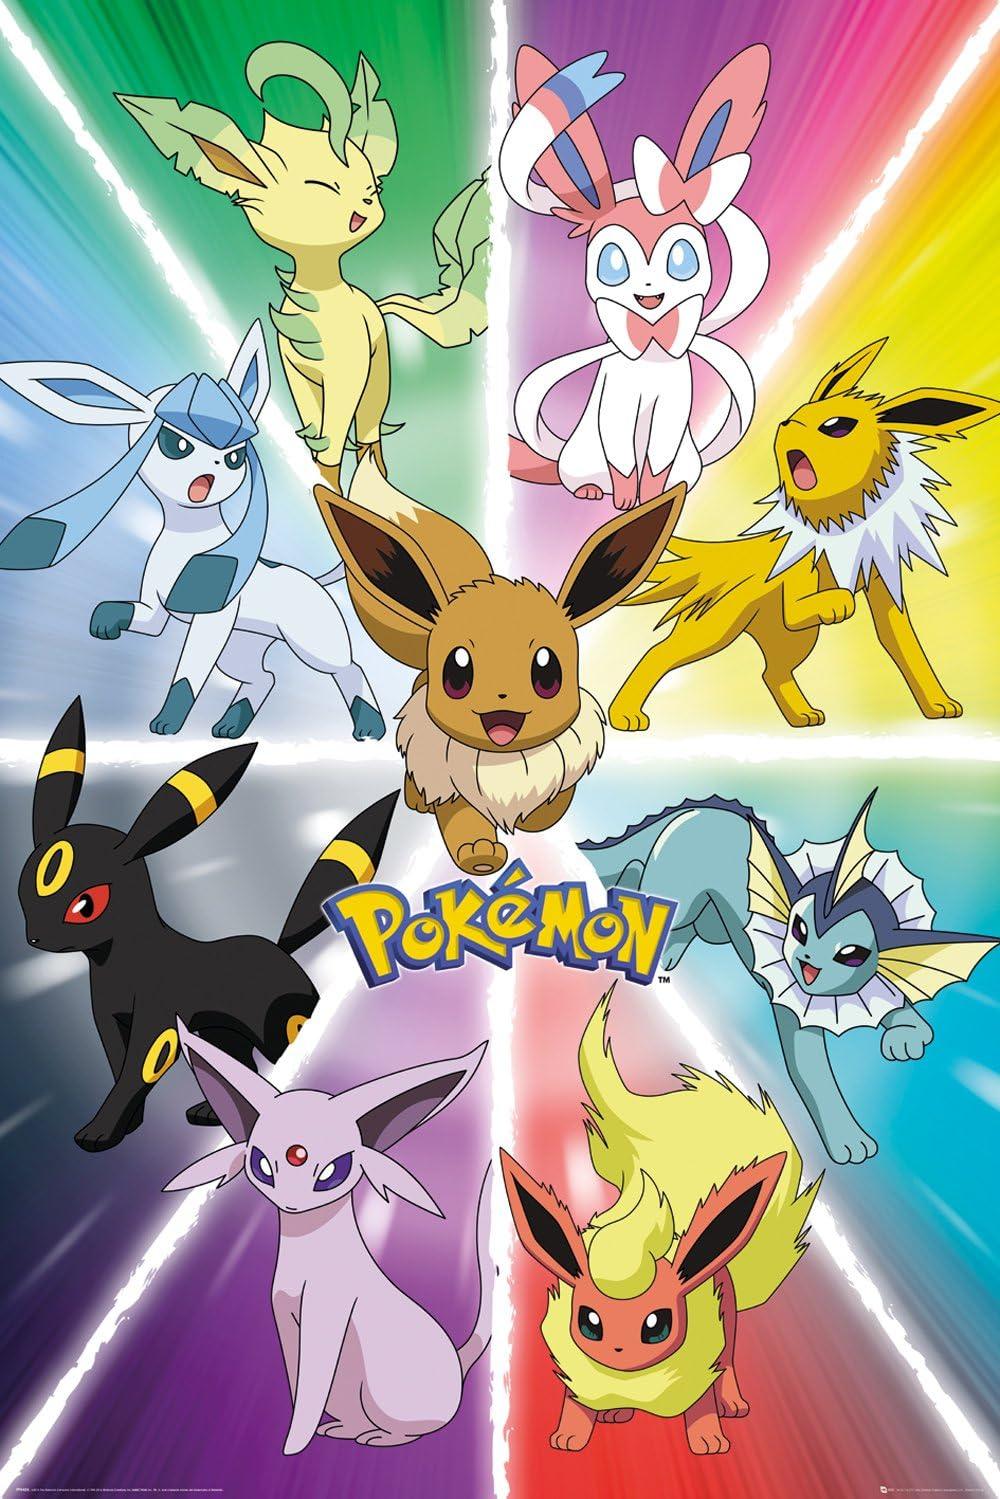 GB Eye Eevee Evolution Pokemon - Póster maxi: Amazon.es: Hogar